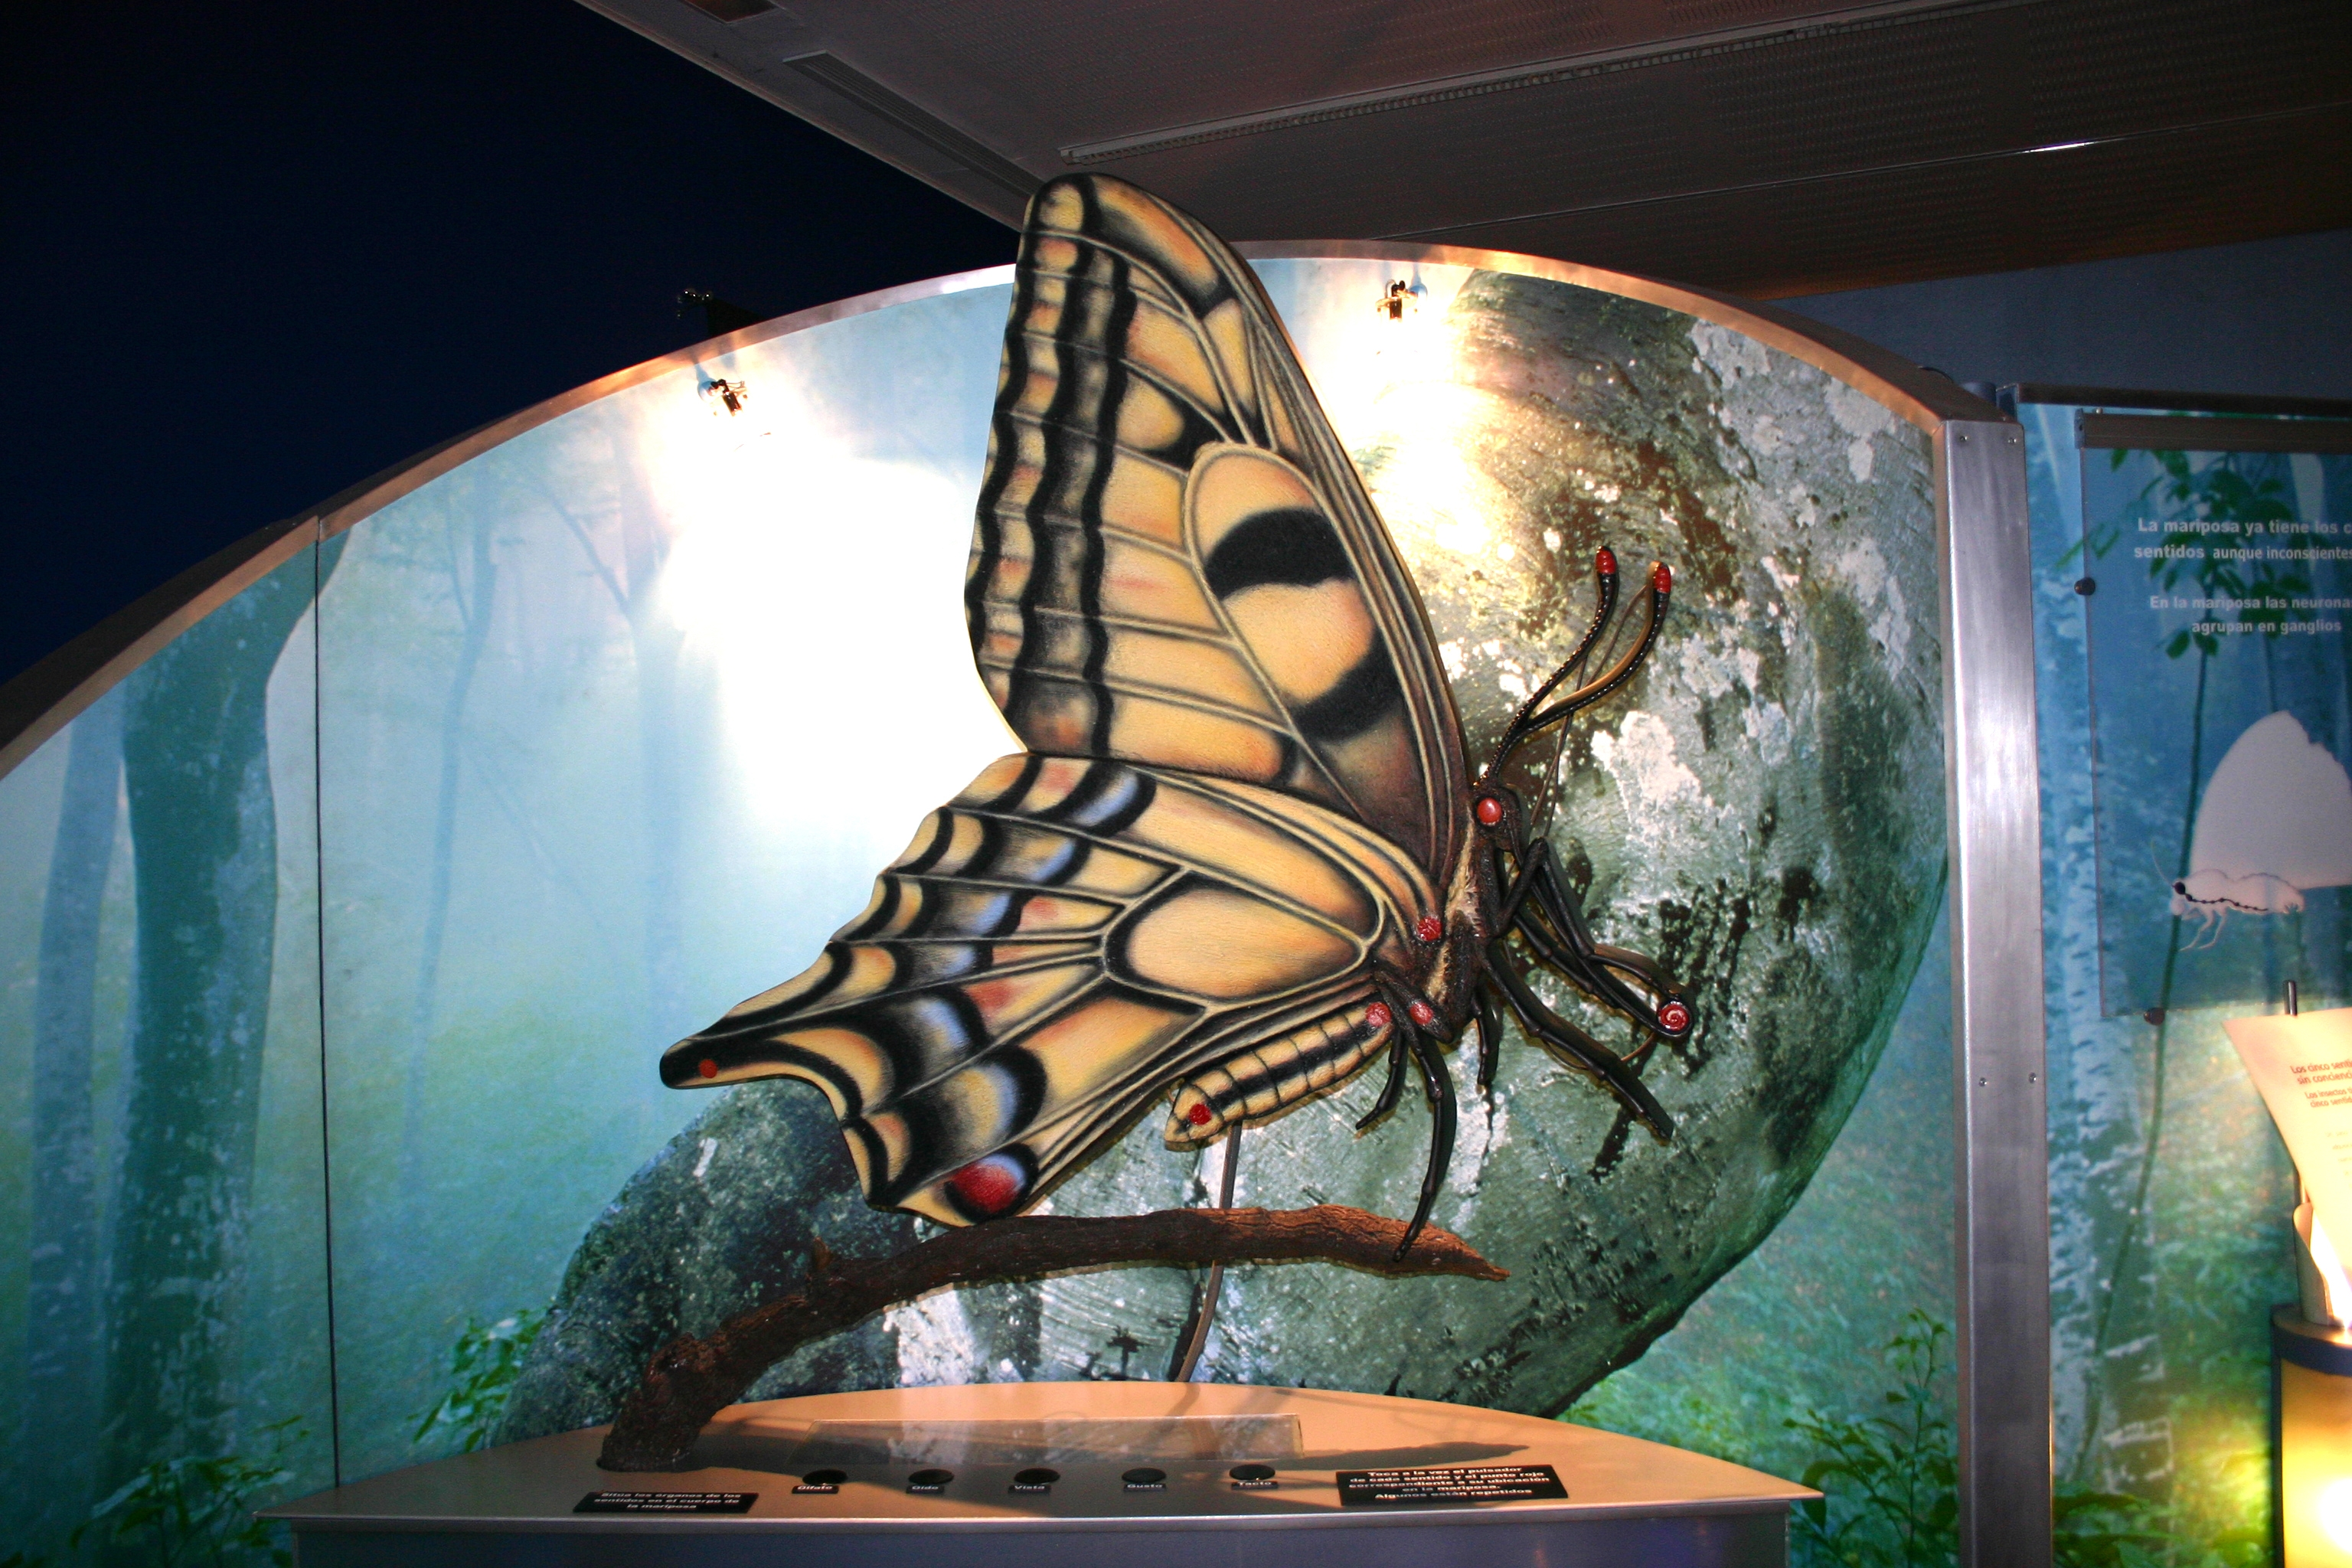 Archivo Museocienciavalladolidneurona Jpg Wikipedia La